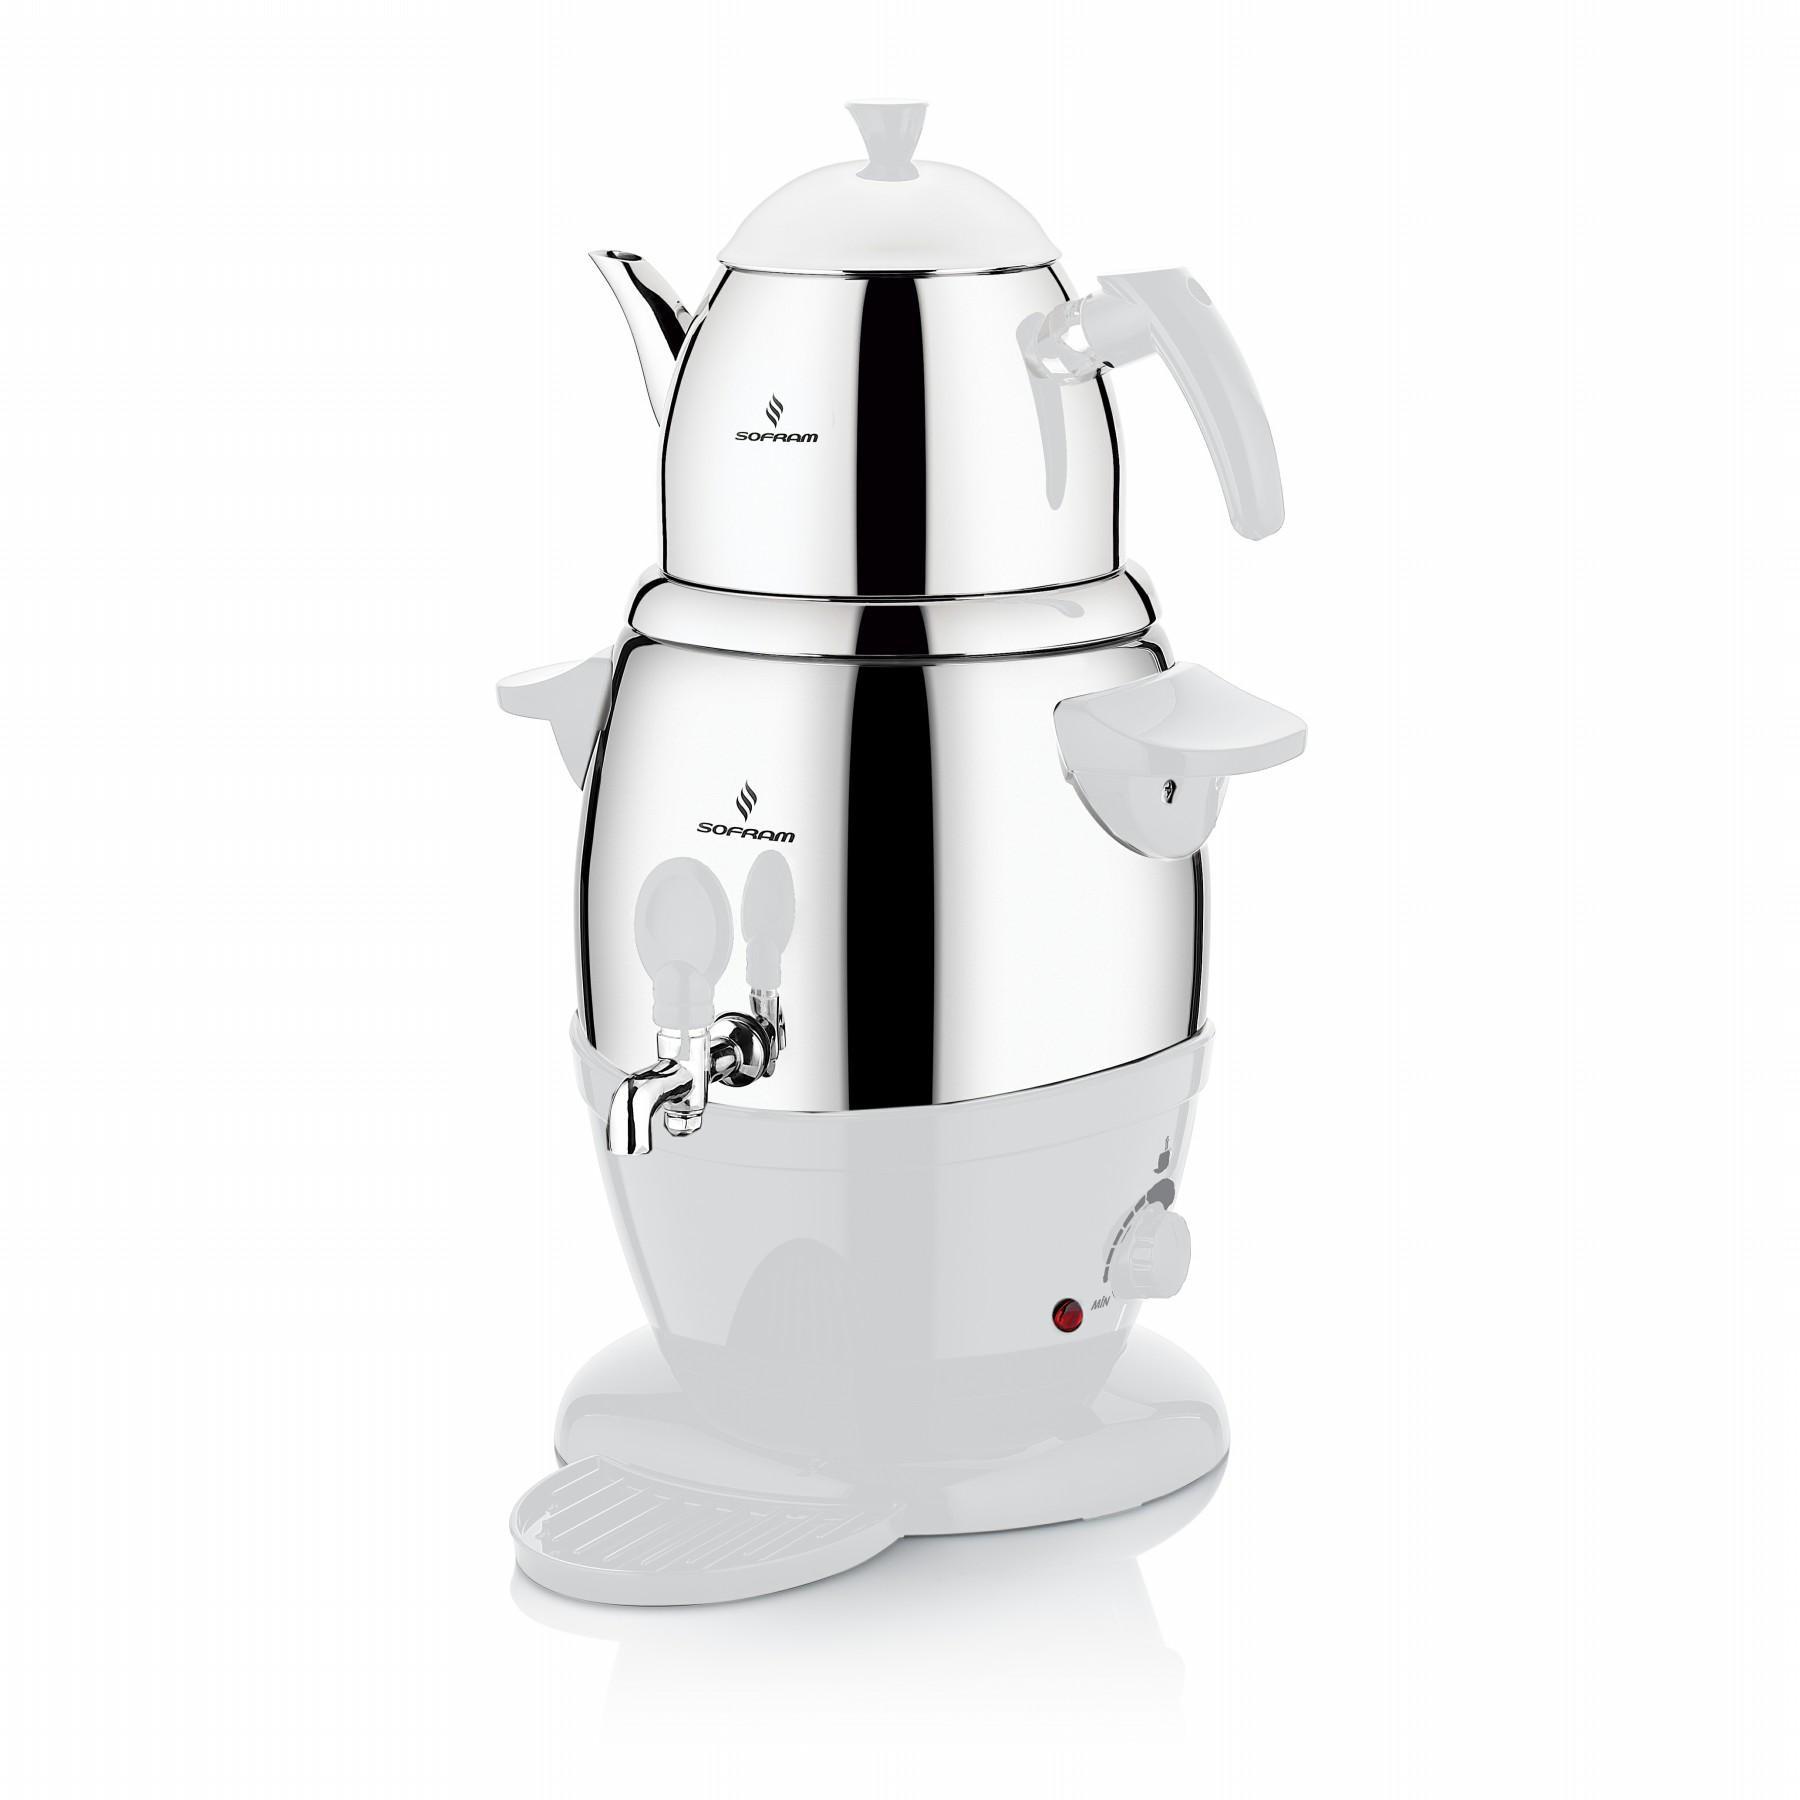 Sofram Electric Turkish Tea White Semavor